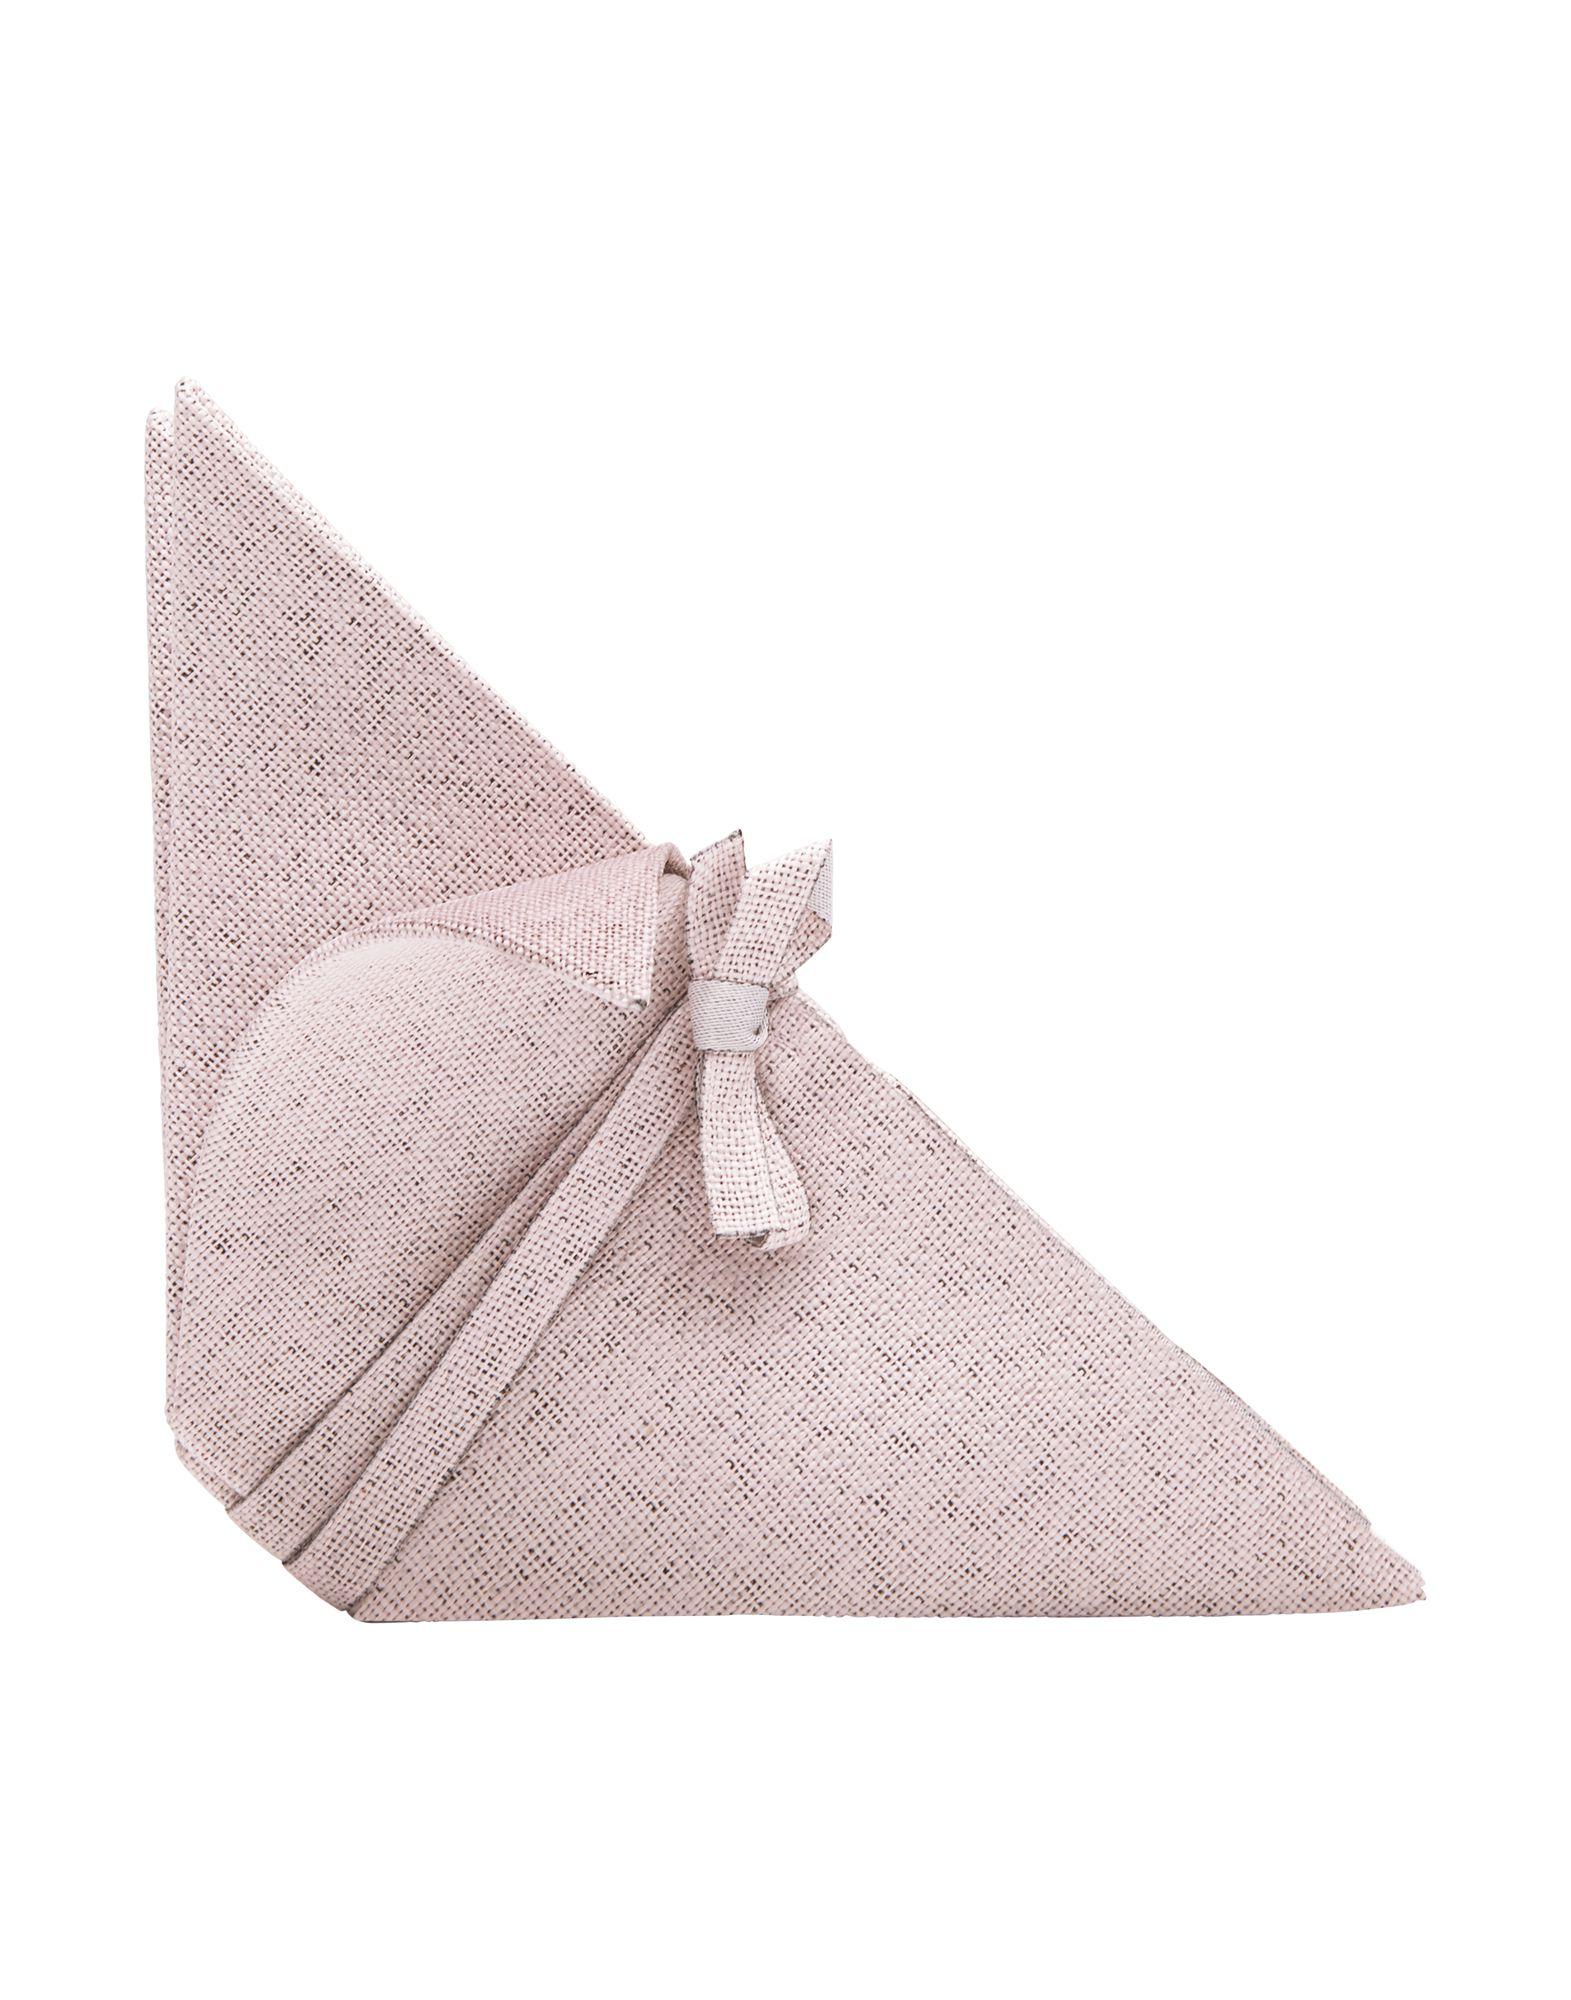 ISSEY MIYAKE X IITTALA Салфетка luxury designer sac femme for hand tote cross body shoulder crossbody women messenger genuine leather bag female lady handbag